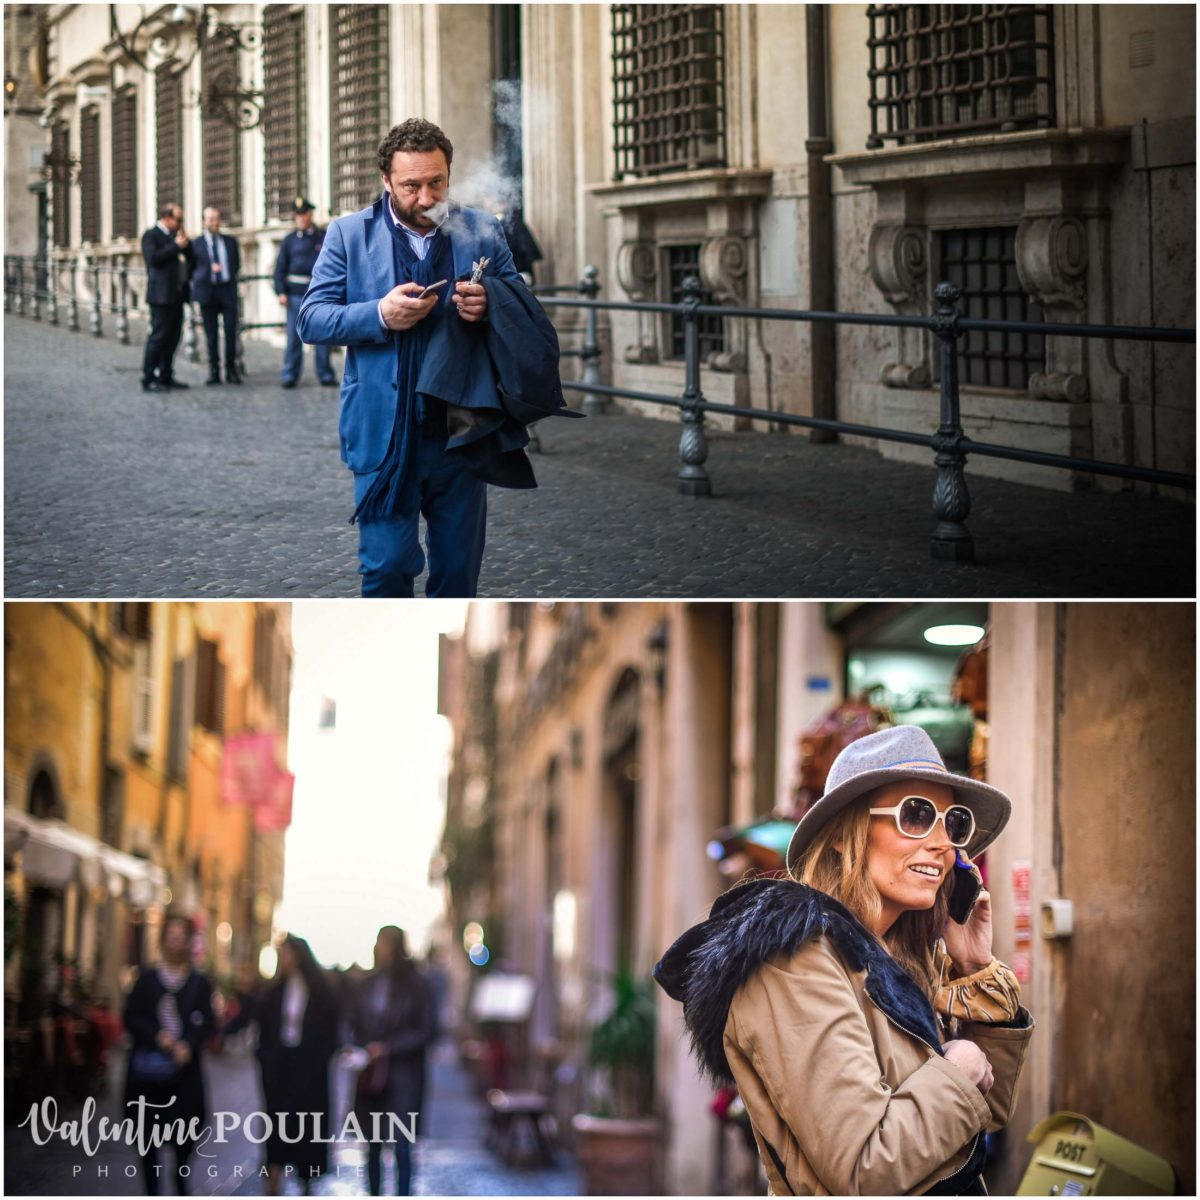 Rome Italie - Valentine Poulain street photography